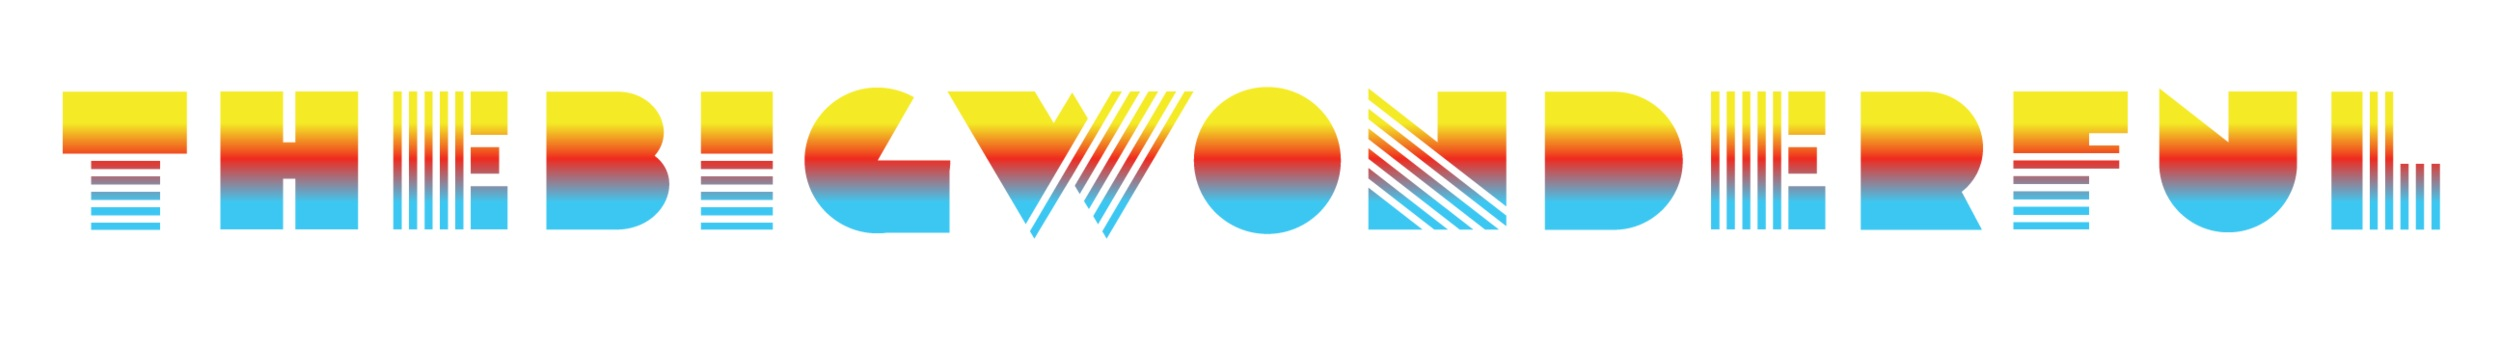 TBW-2018-Logo-3-Color-Gradient.jpg